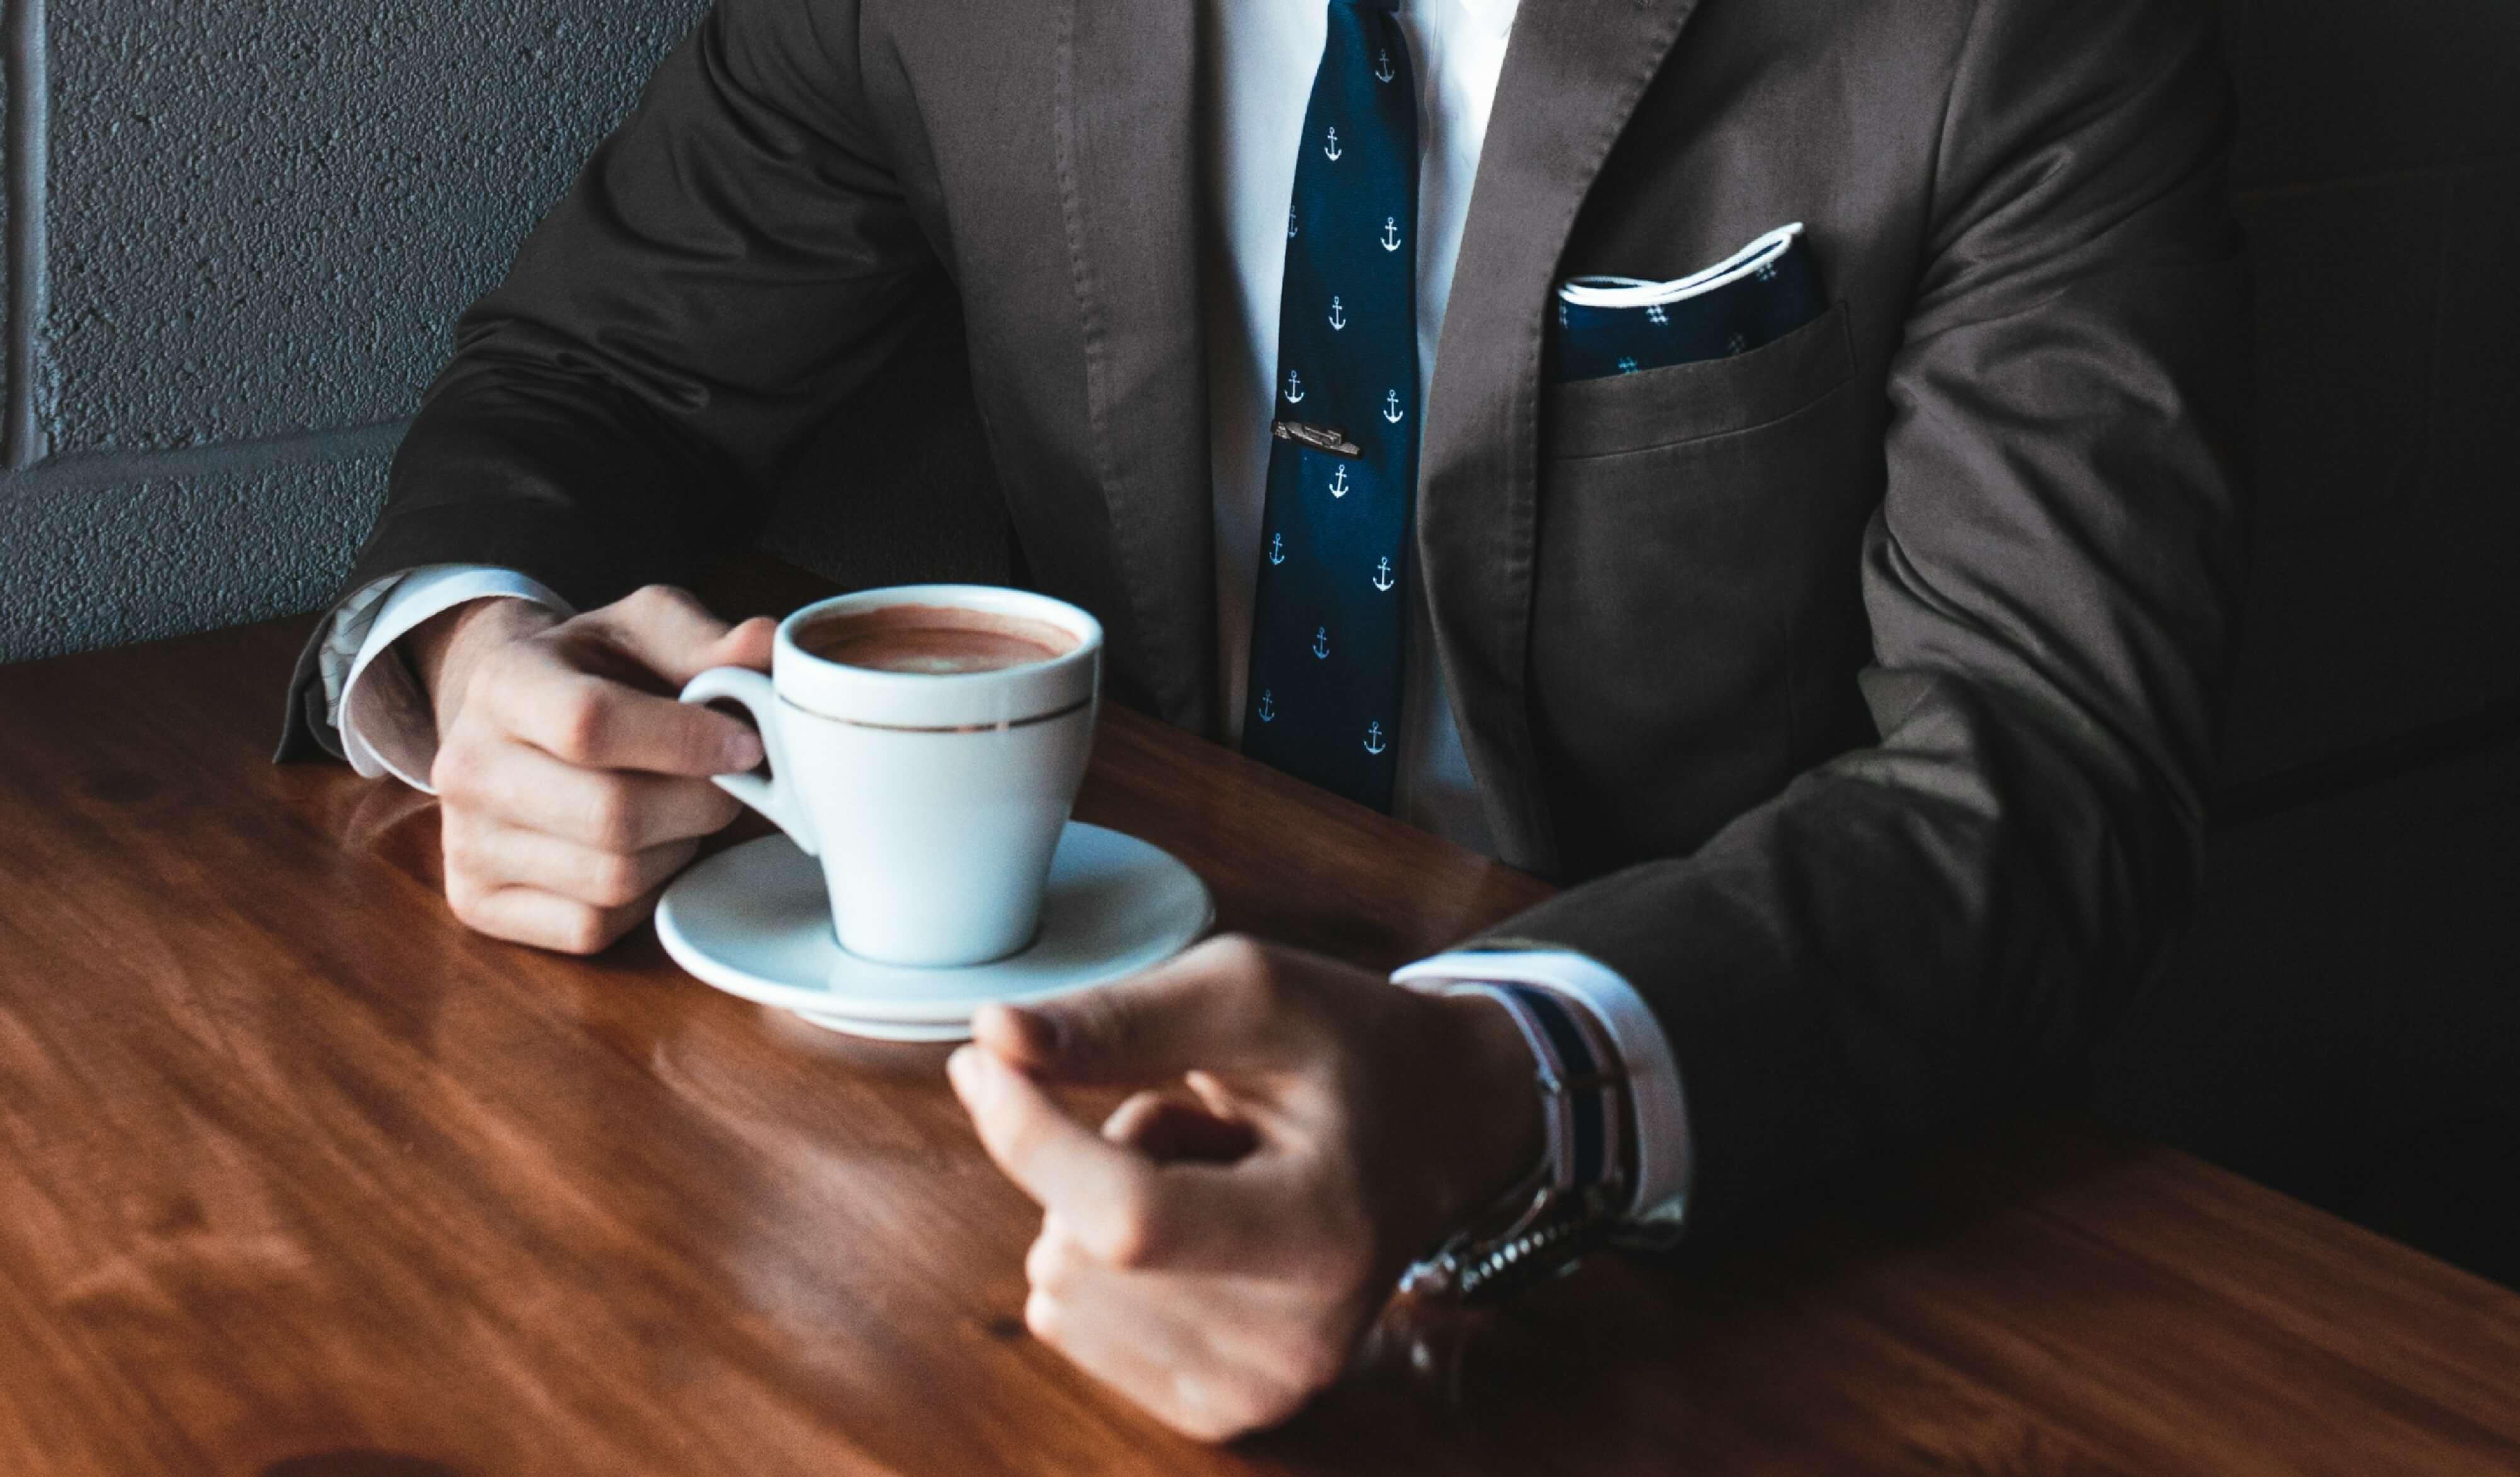 vistage CEO insight survey